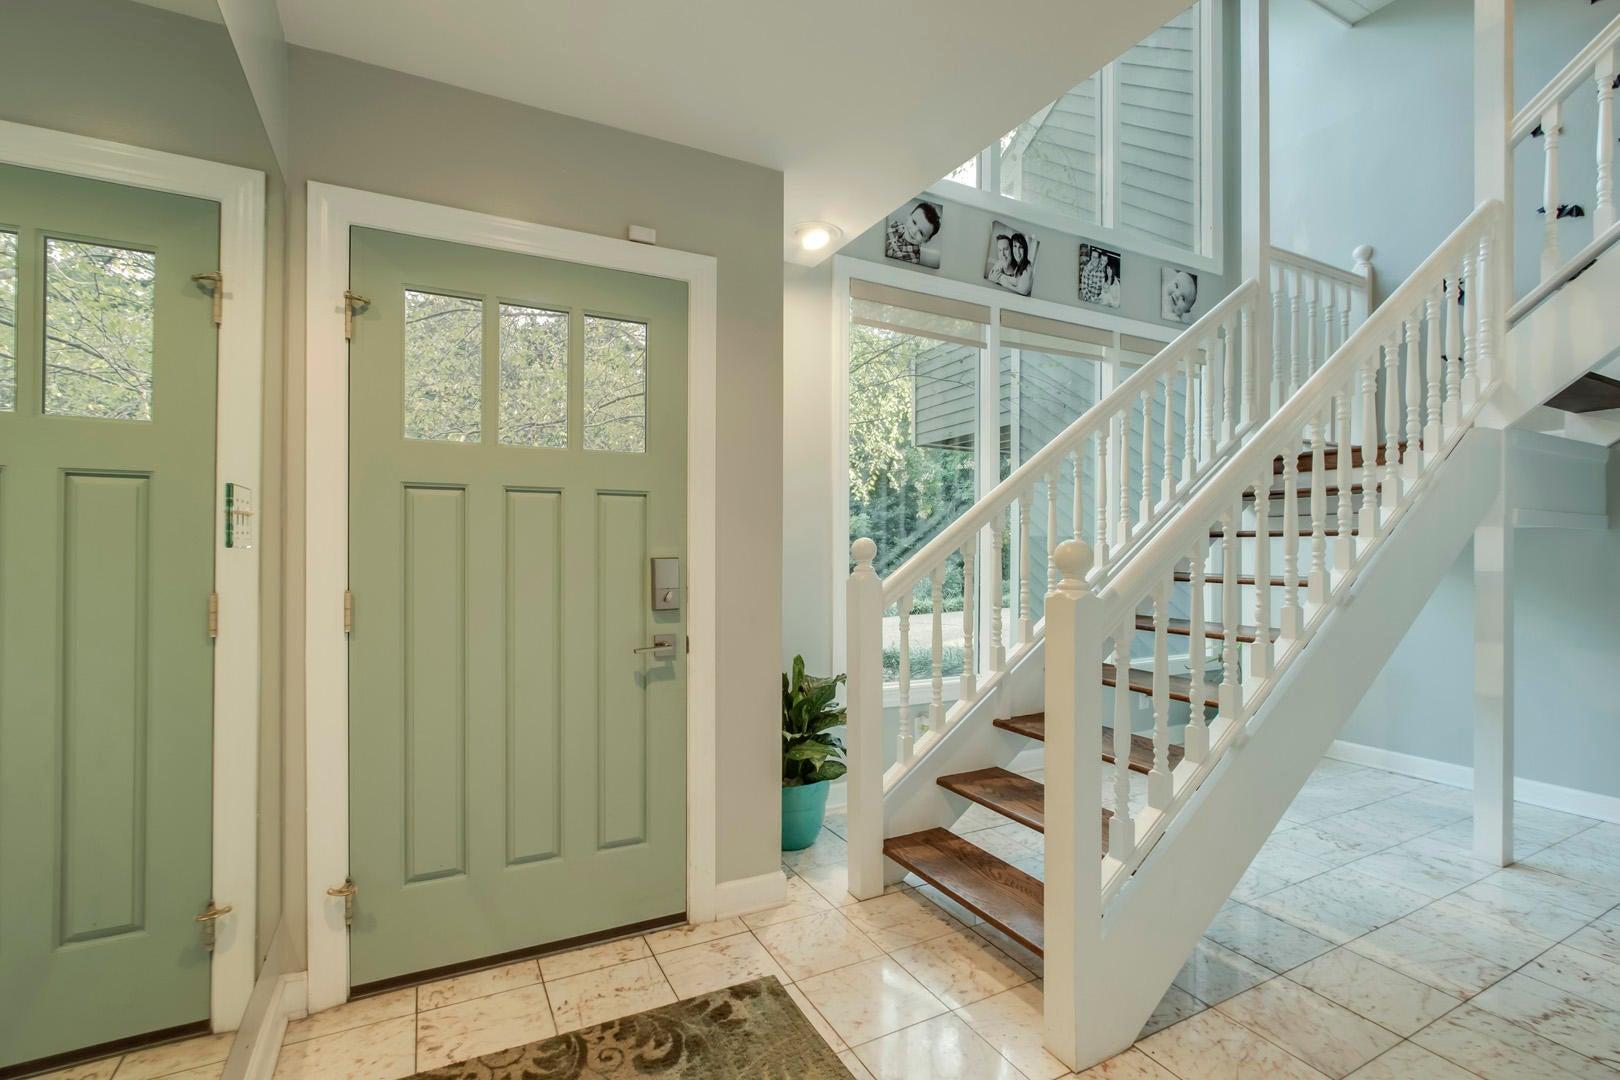 03_OakhurstDriveSW_431_Entry-L1-StairsUp